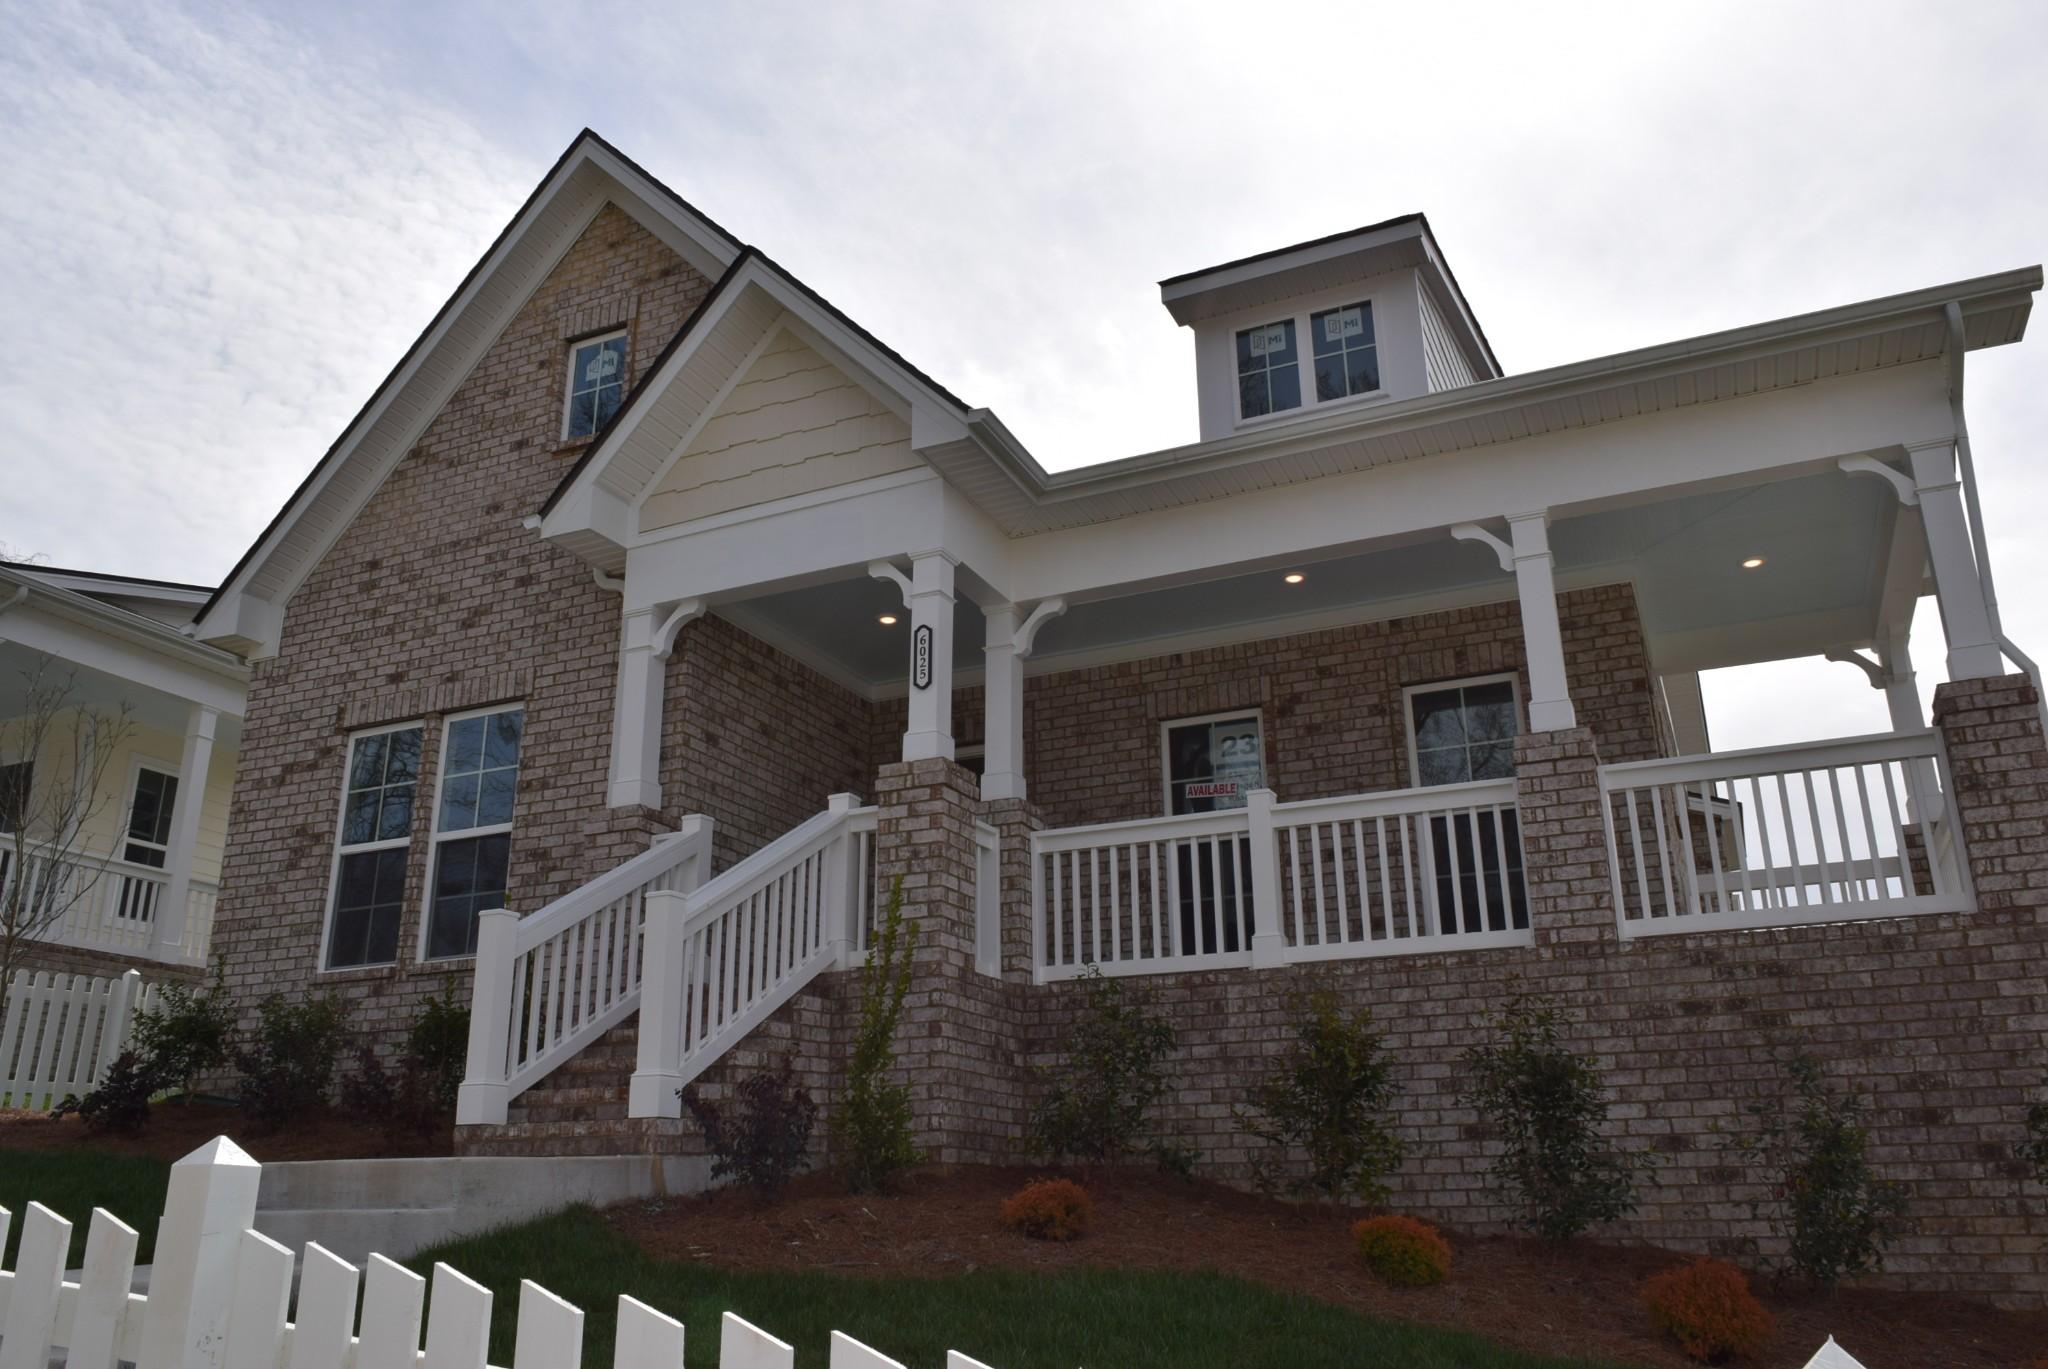 6025 Mt Pisgah Rd. #23, Nashville, TN 37211 - Nashville, TN real estate listing